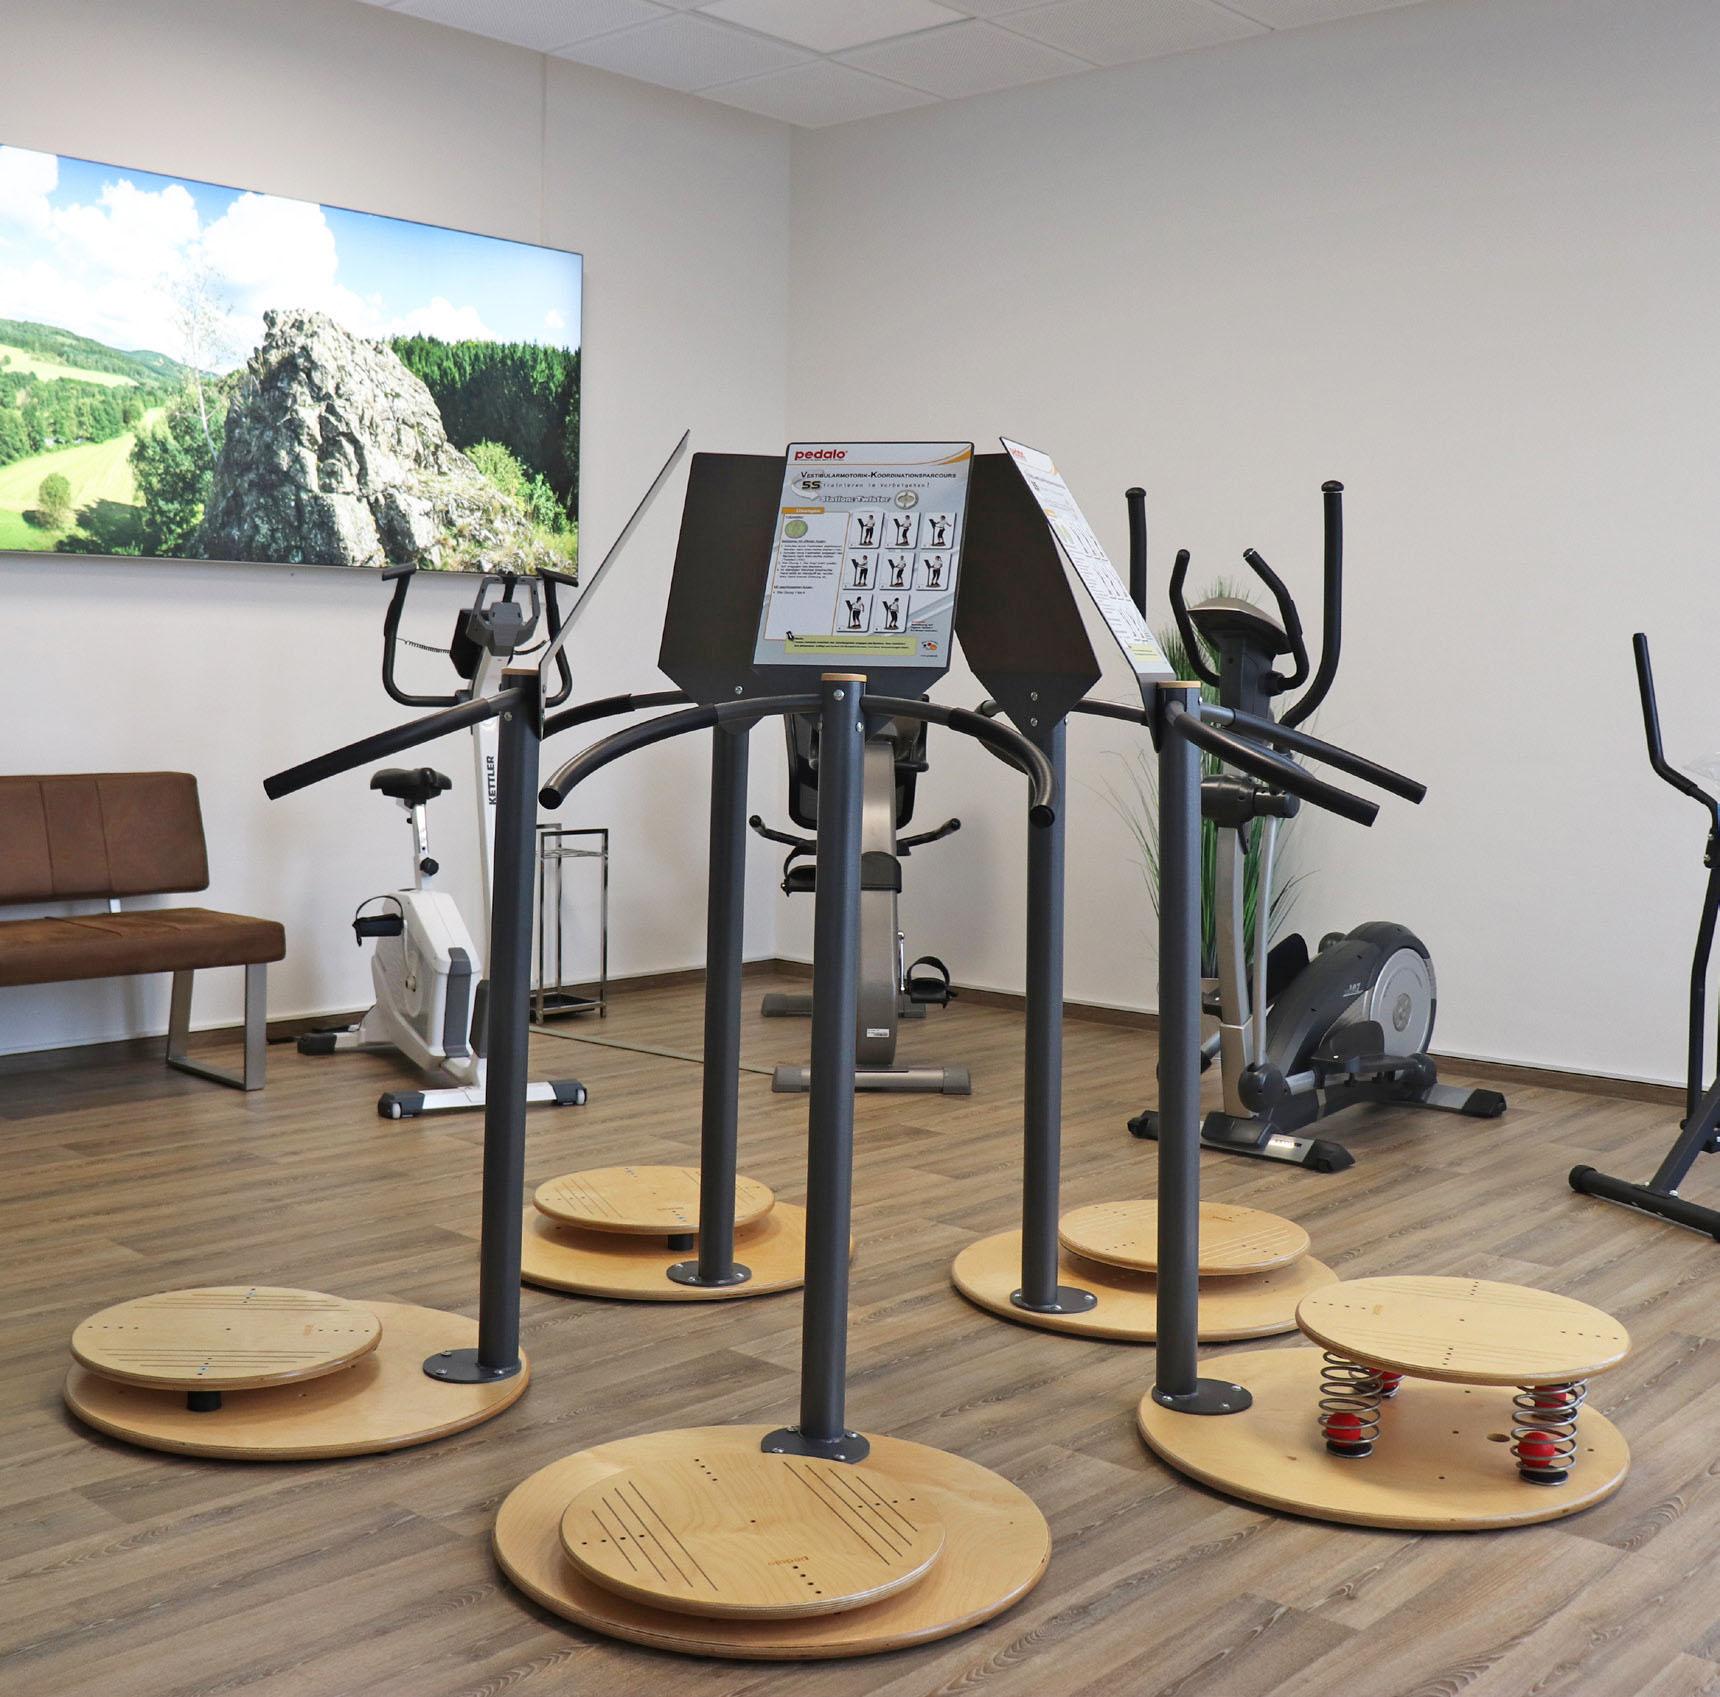 Fitnessraum mit Trainingsgeräten